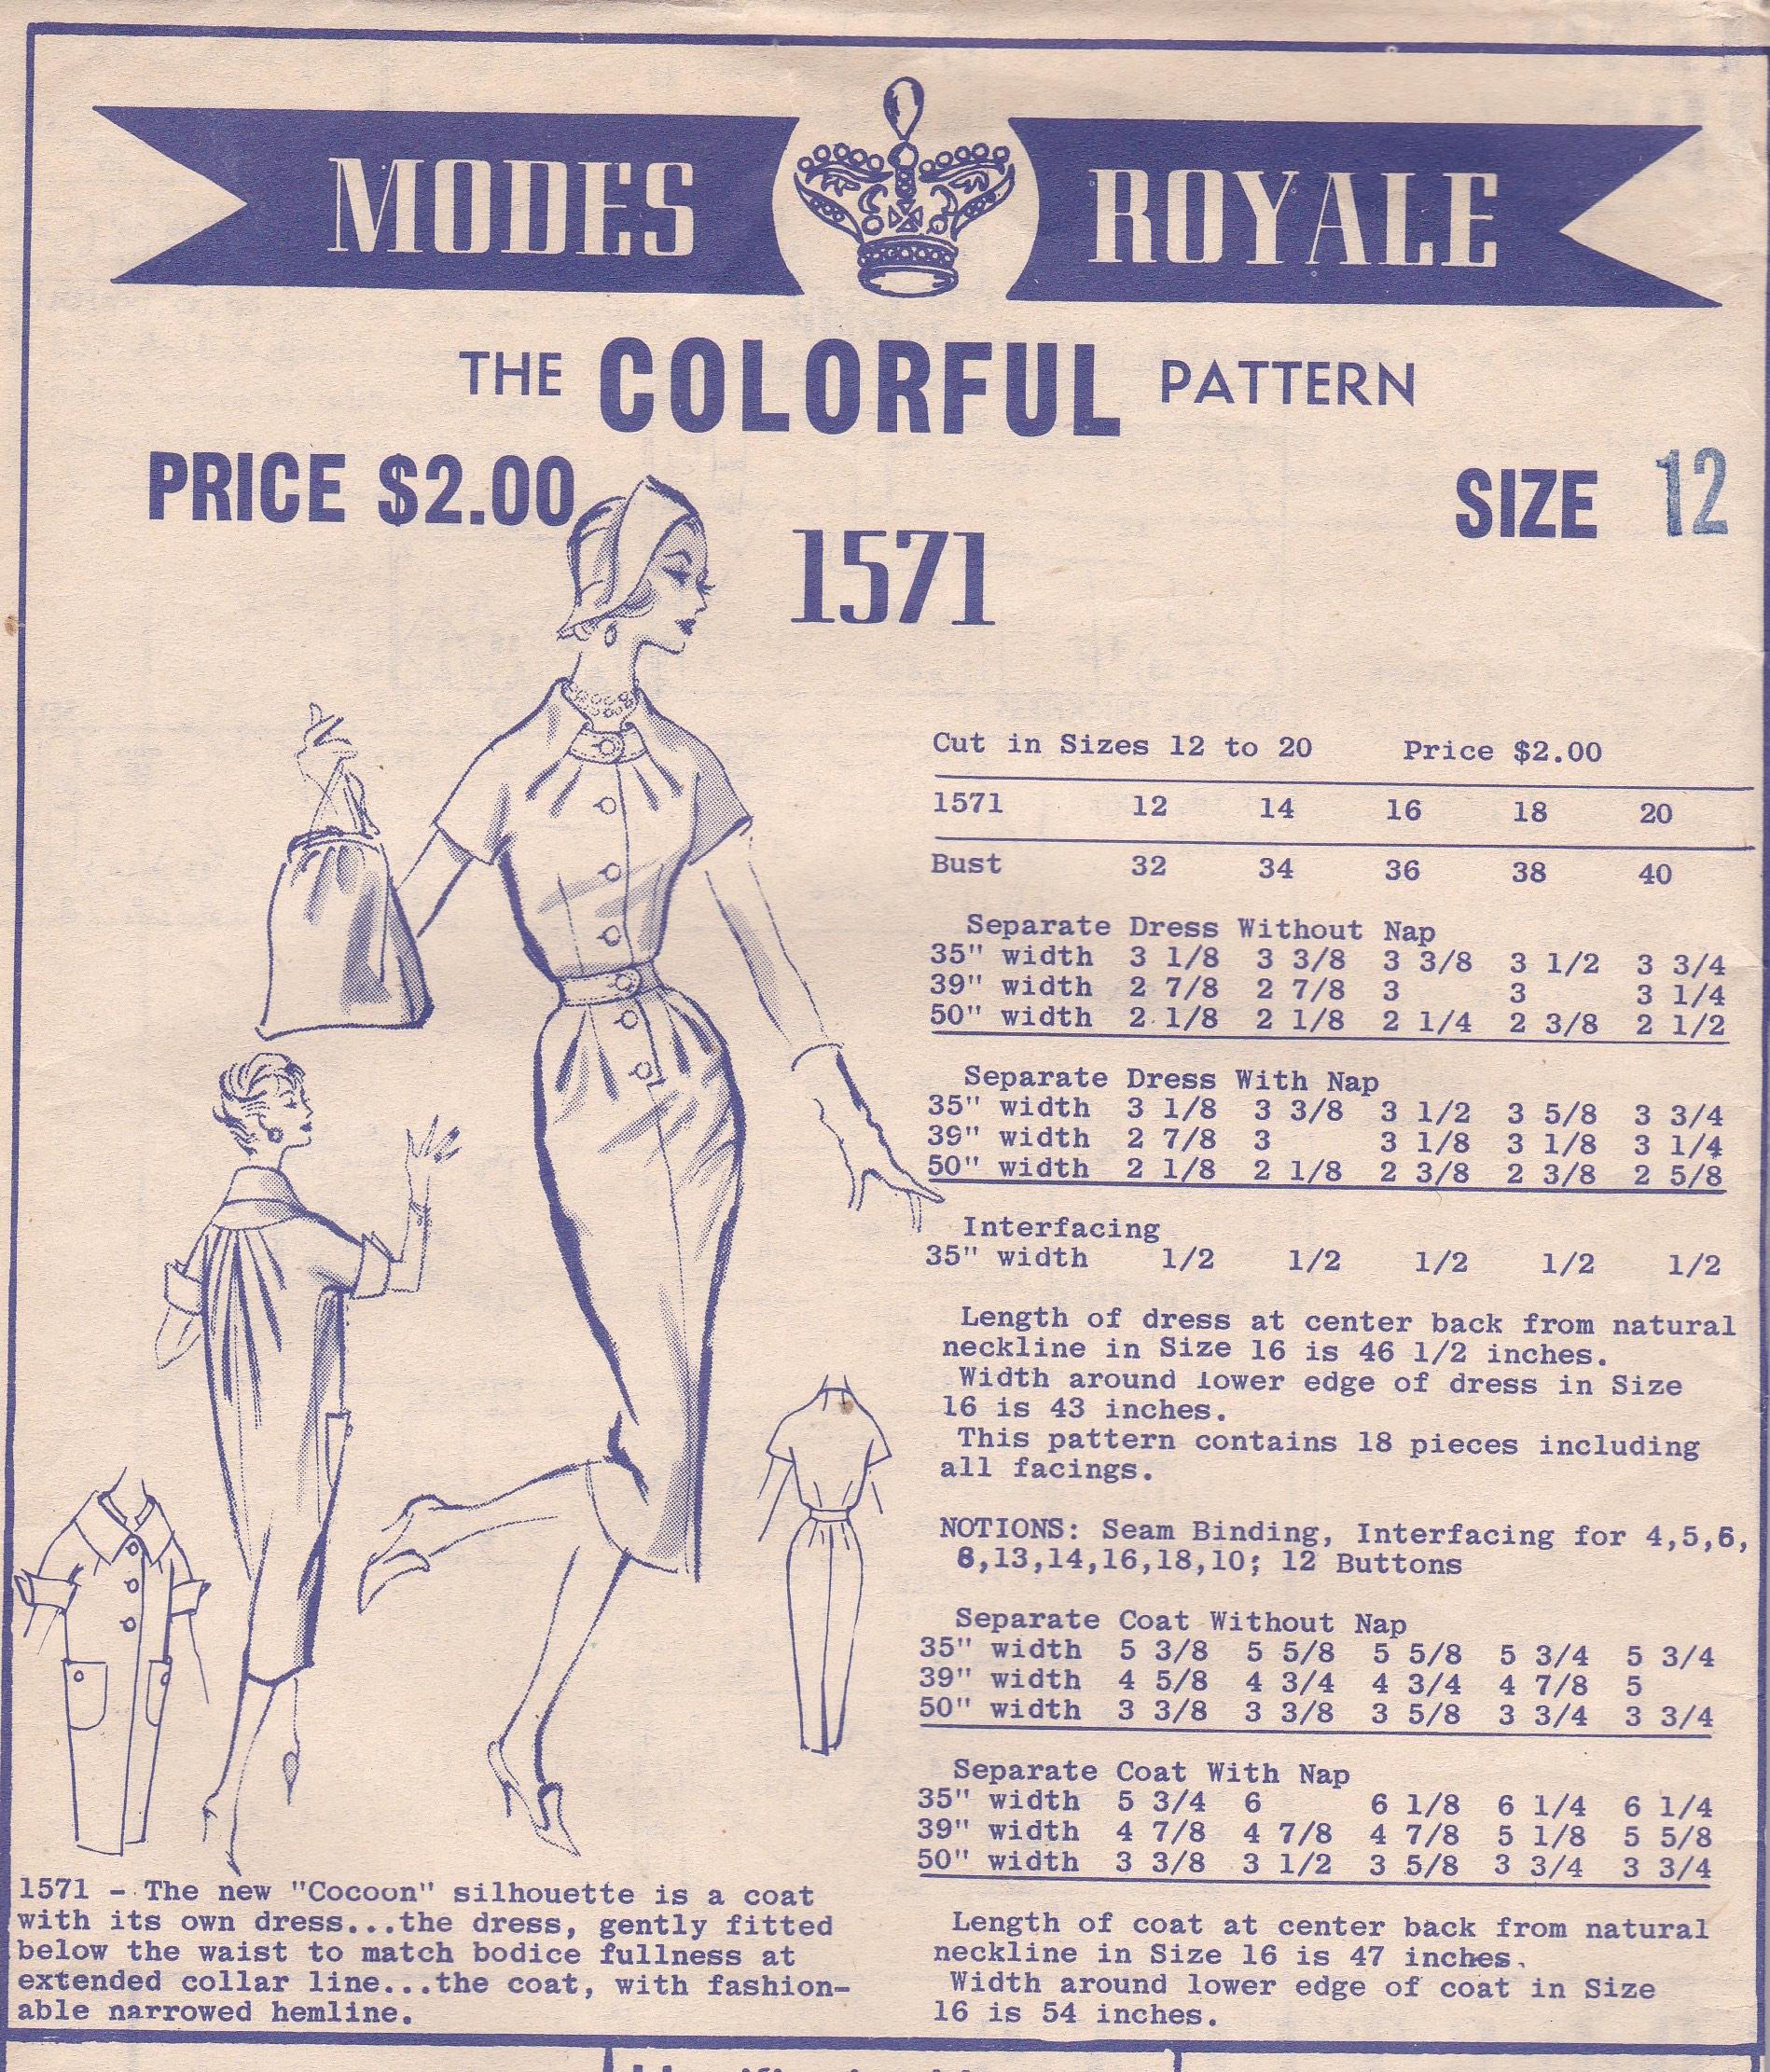 Modes Royale 1571